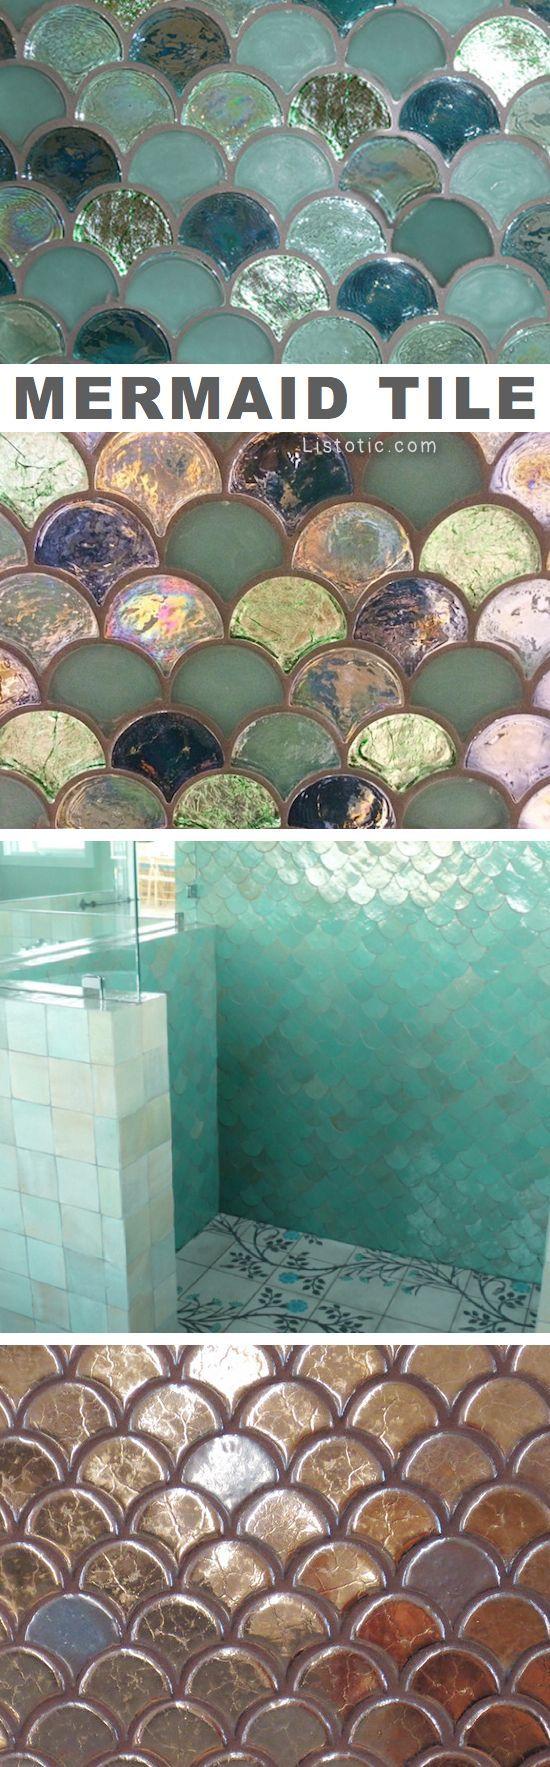 11 Stunning Tile Ideas For Your Home (Decor Ideas) | Mermaid tile ...